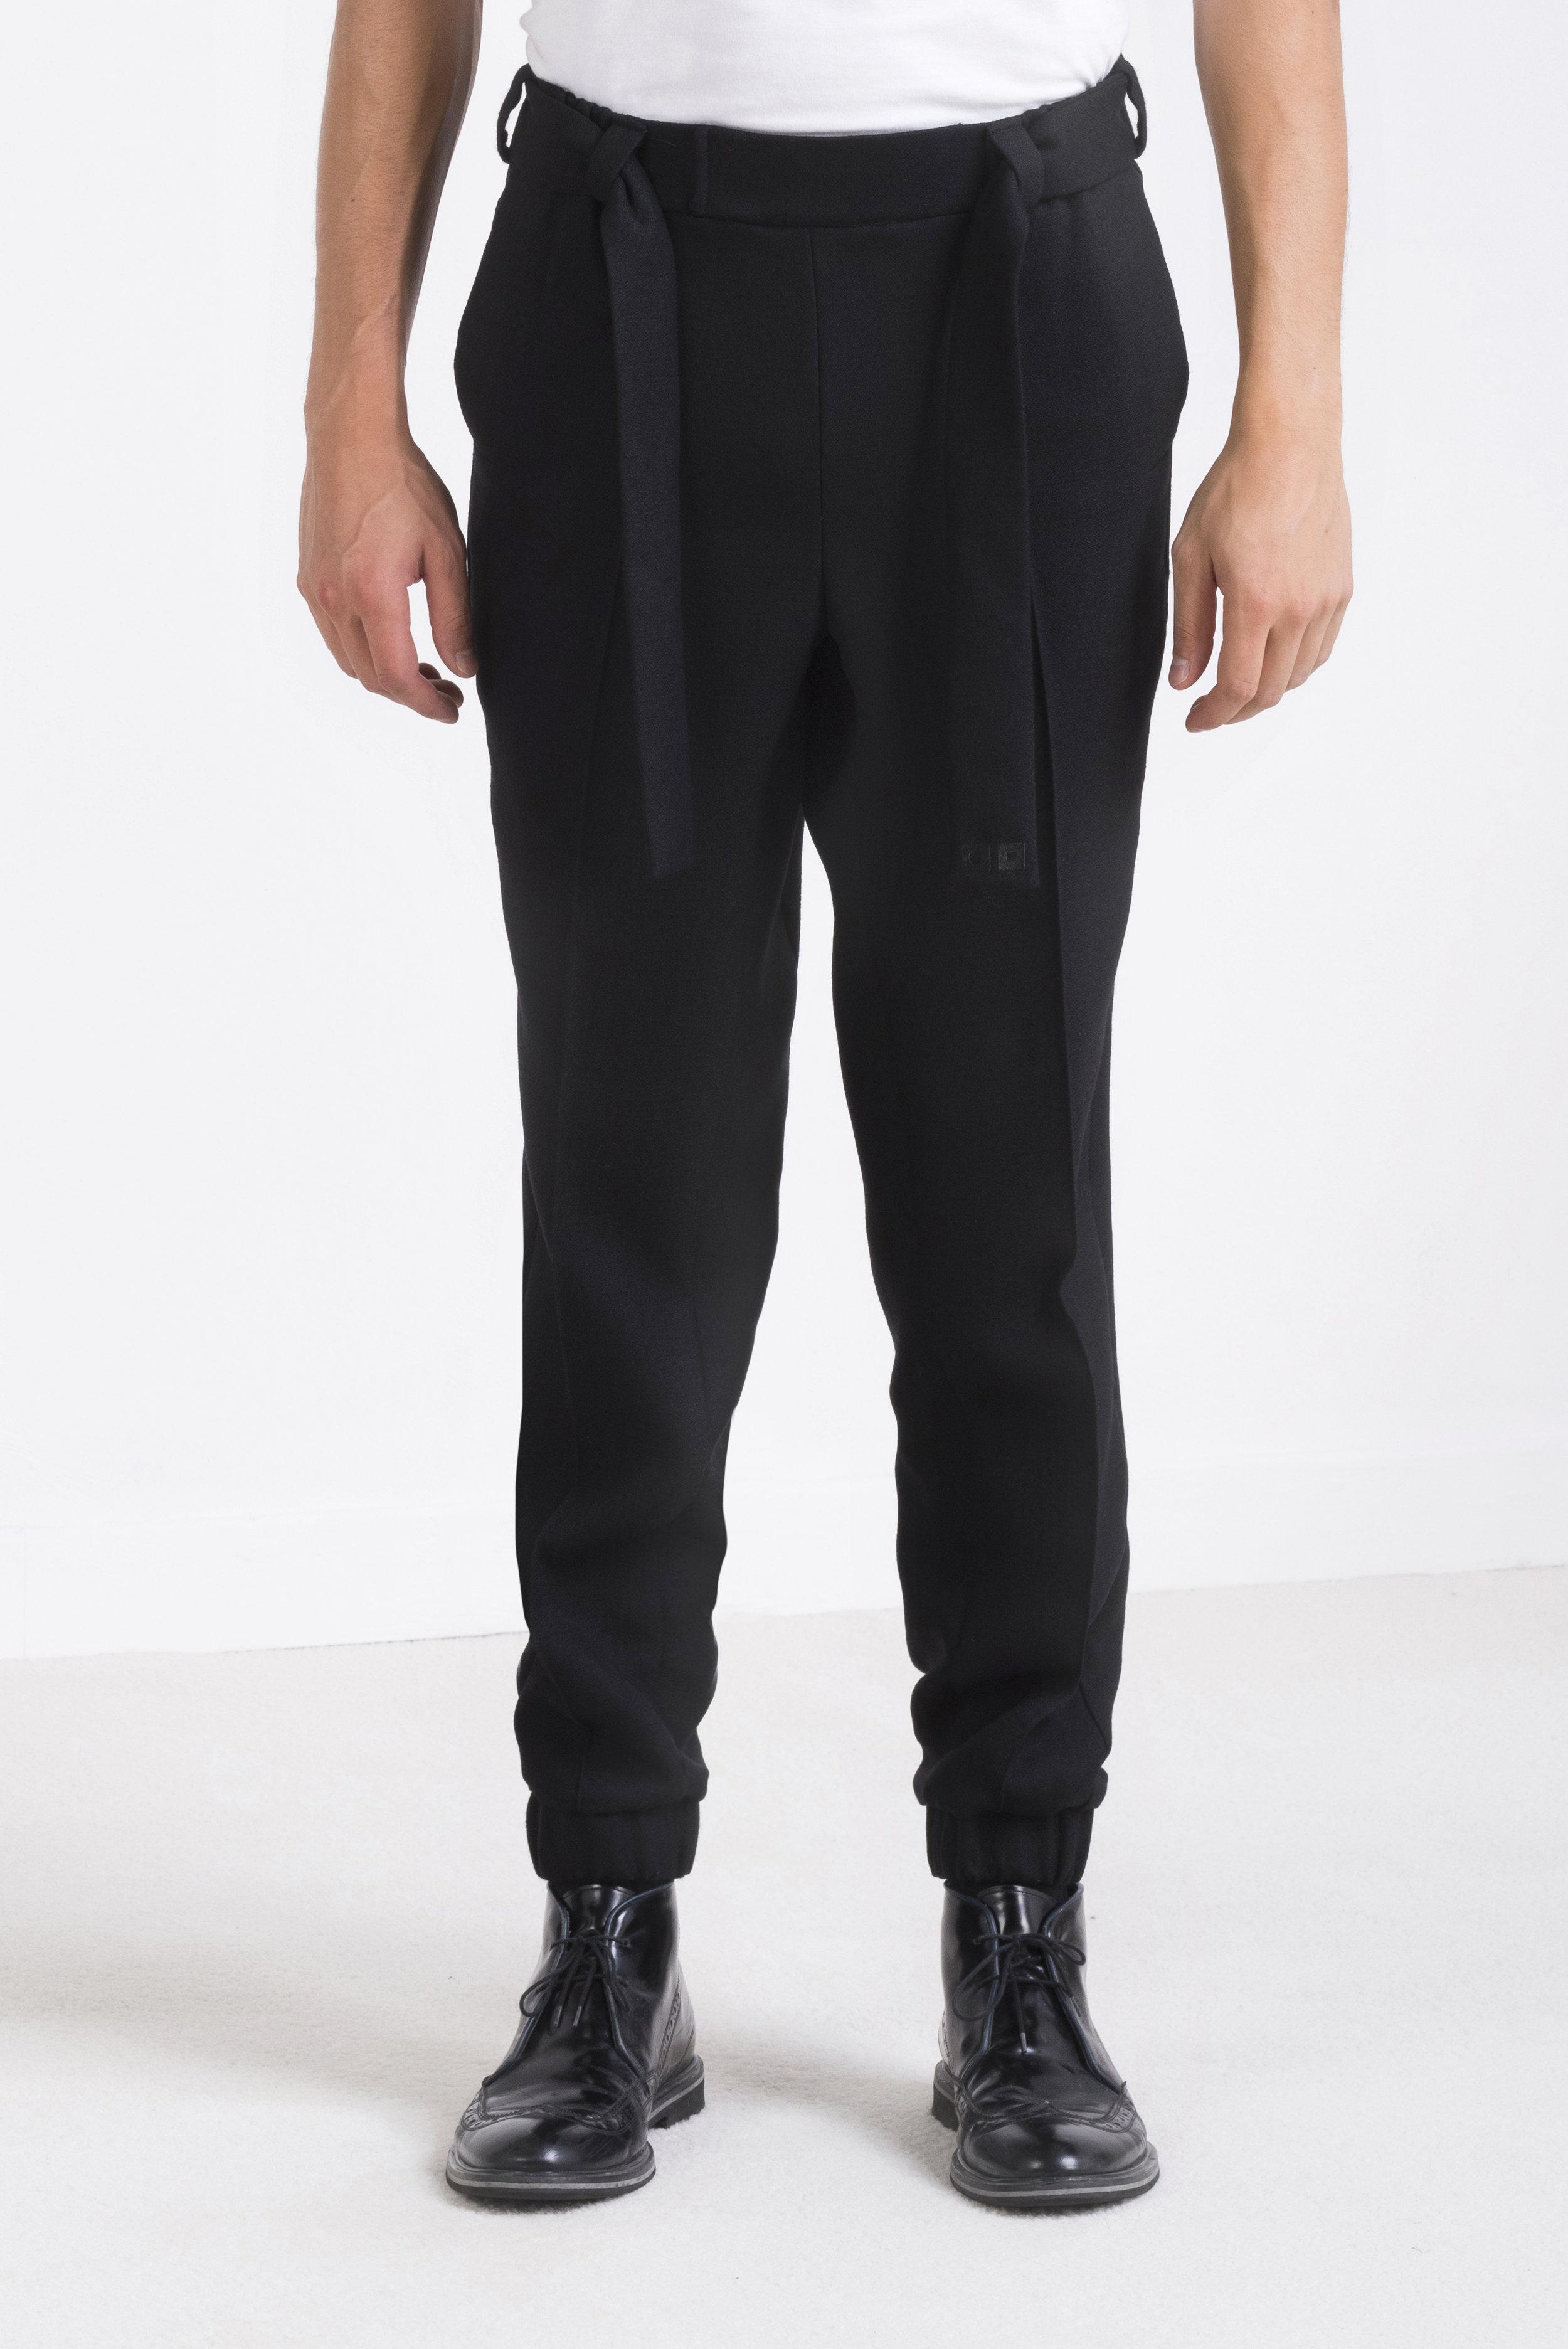 oneculture Wool track pants 2.jpg